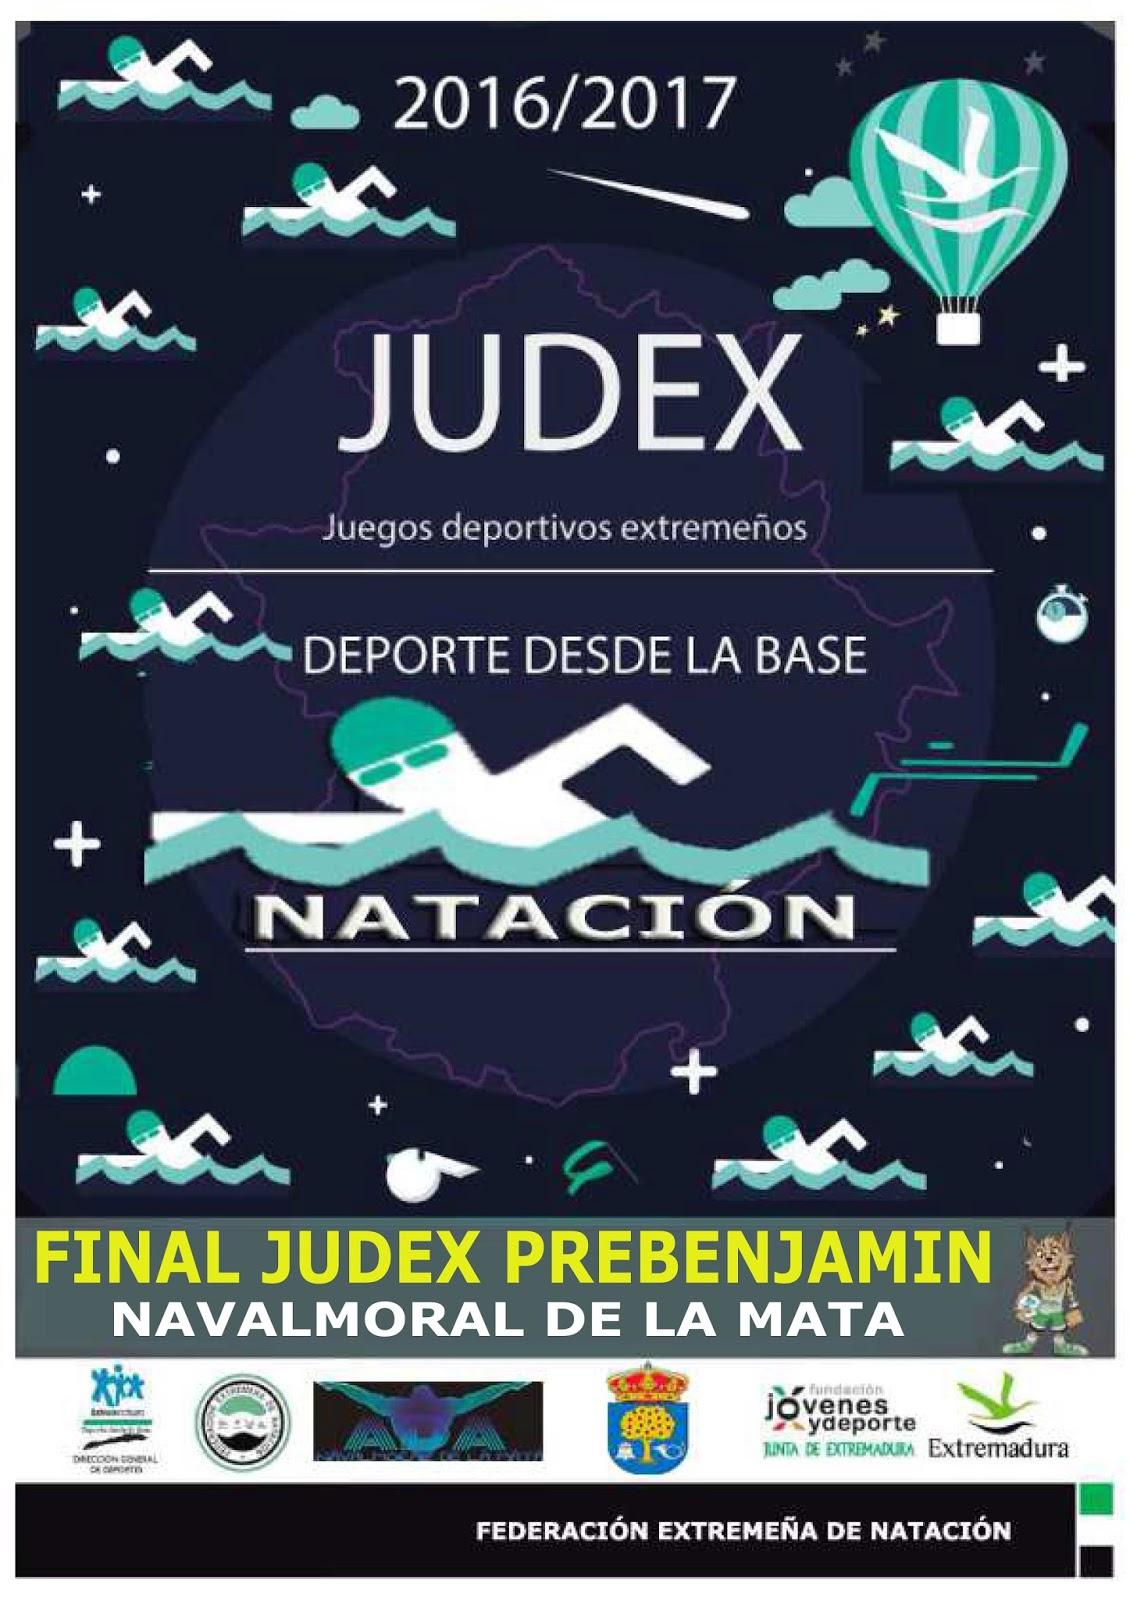 Alonso lozano mi blog final judex prebenjam n 2017 for Piscinas naturales navalmoral dela mata